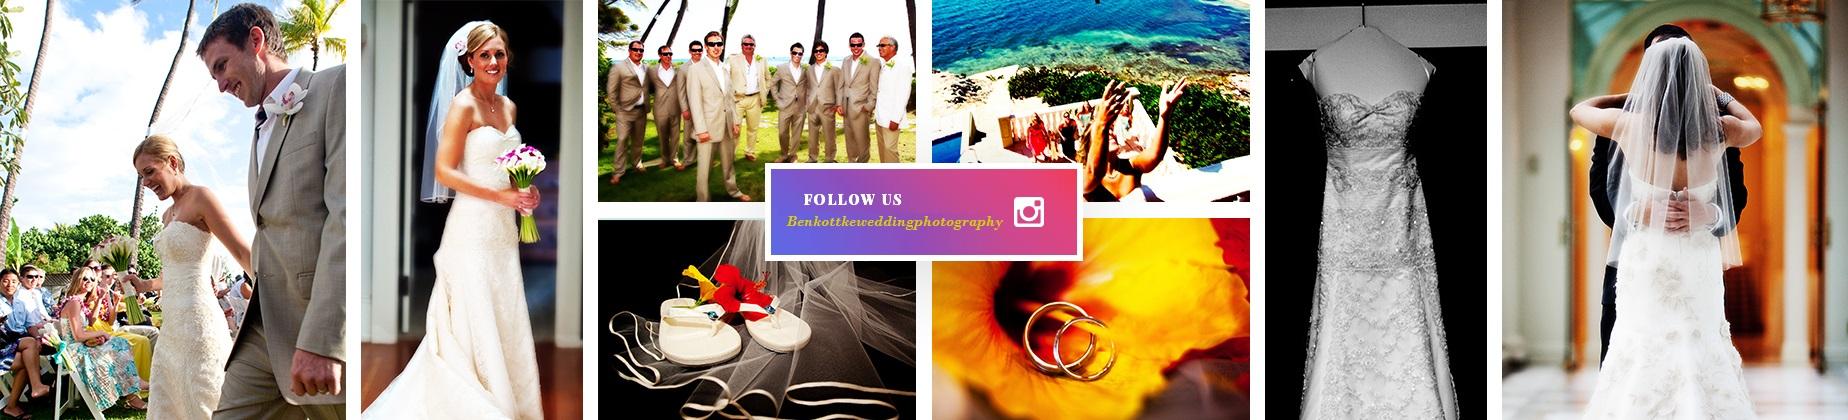 Instagram Gallery Image